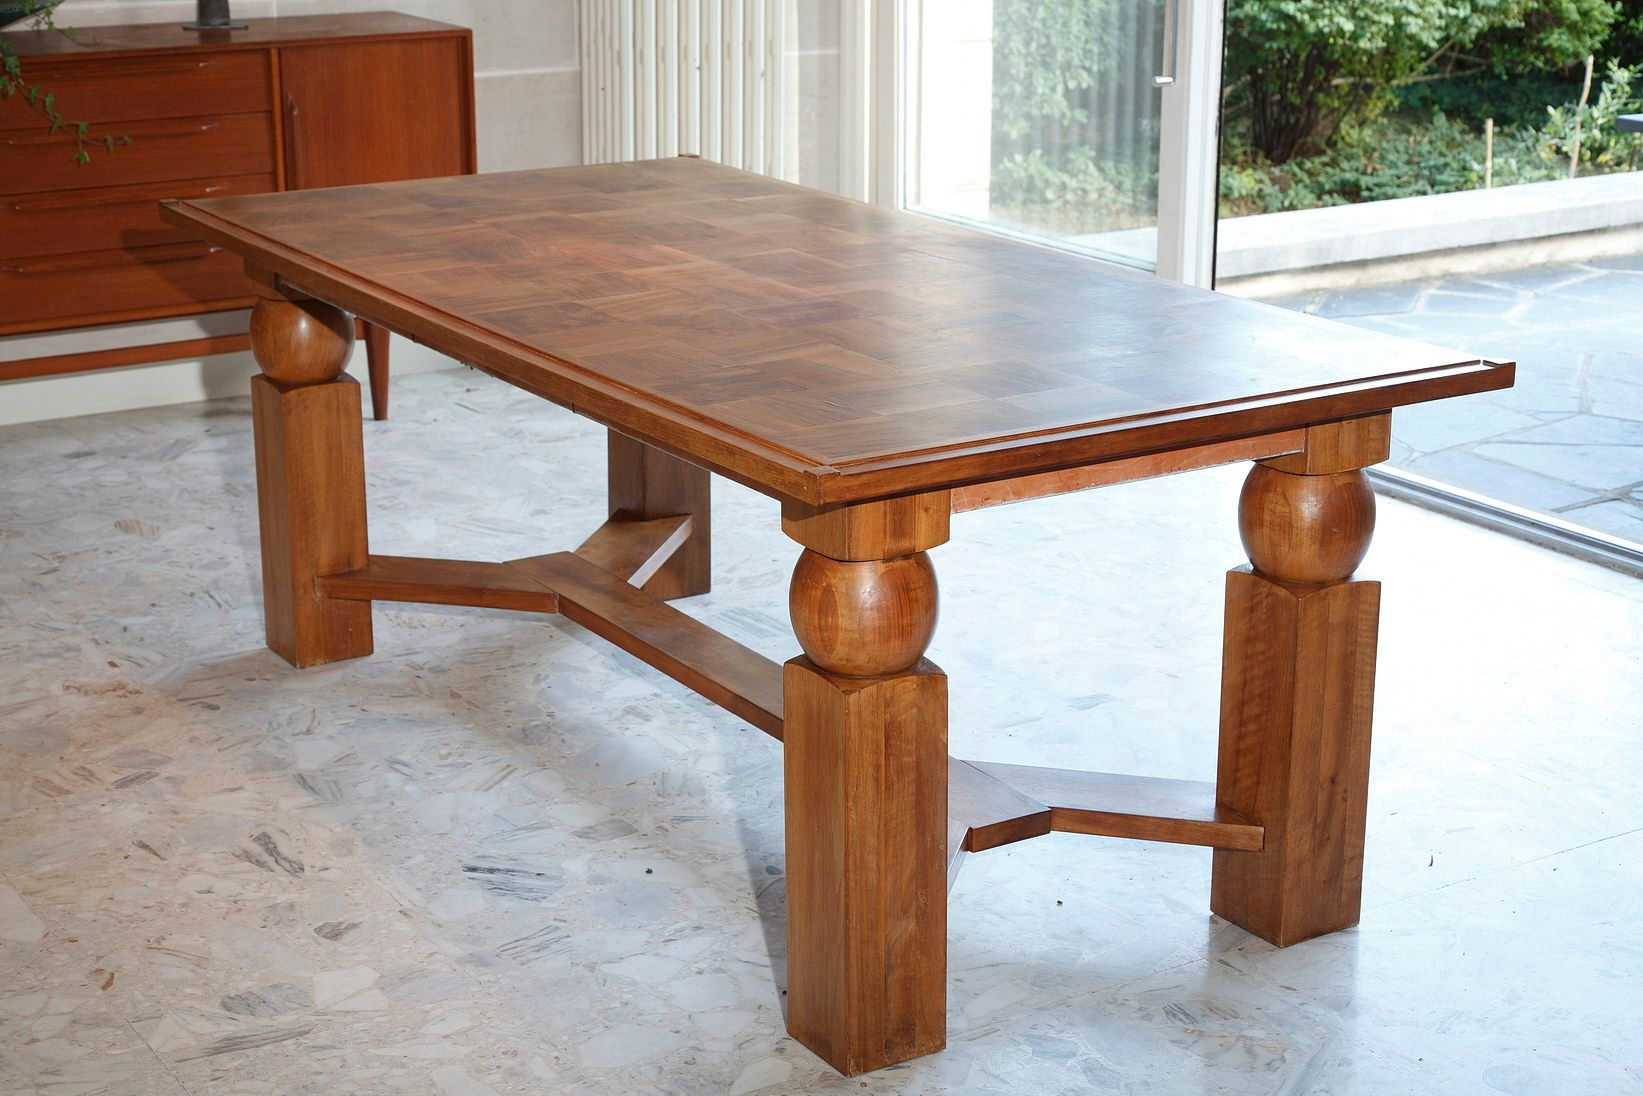 Table de salle manger extensible en bois naturel par for Salle a manger 1950